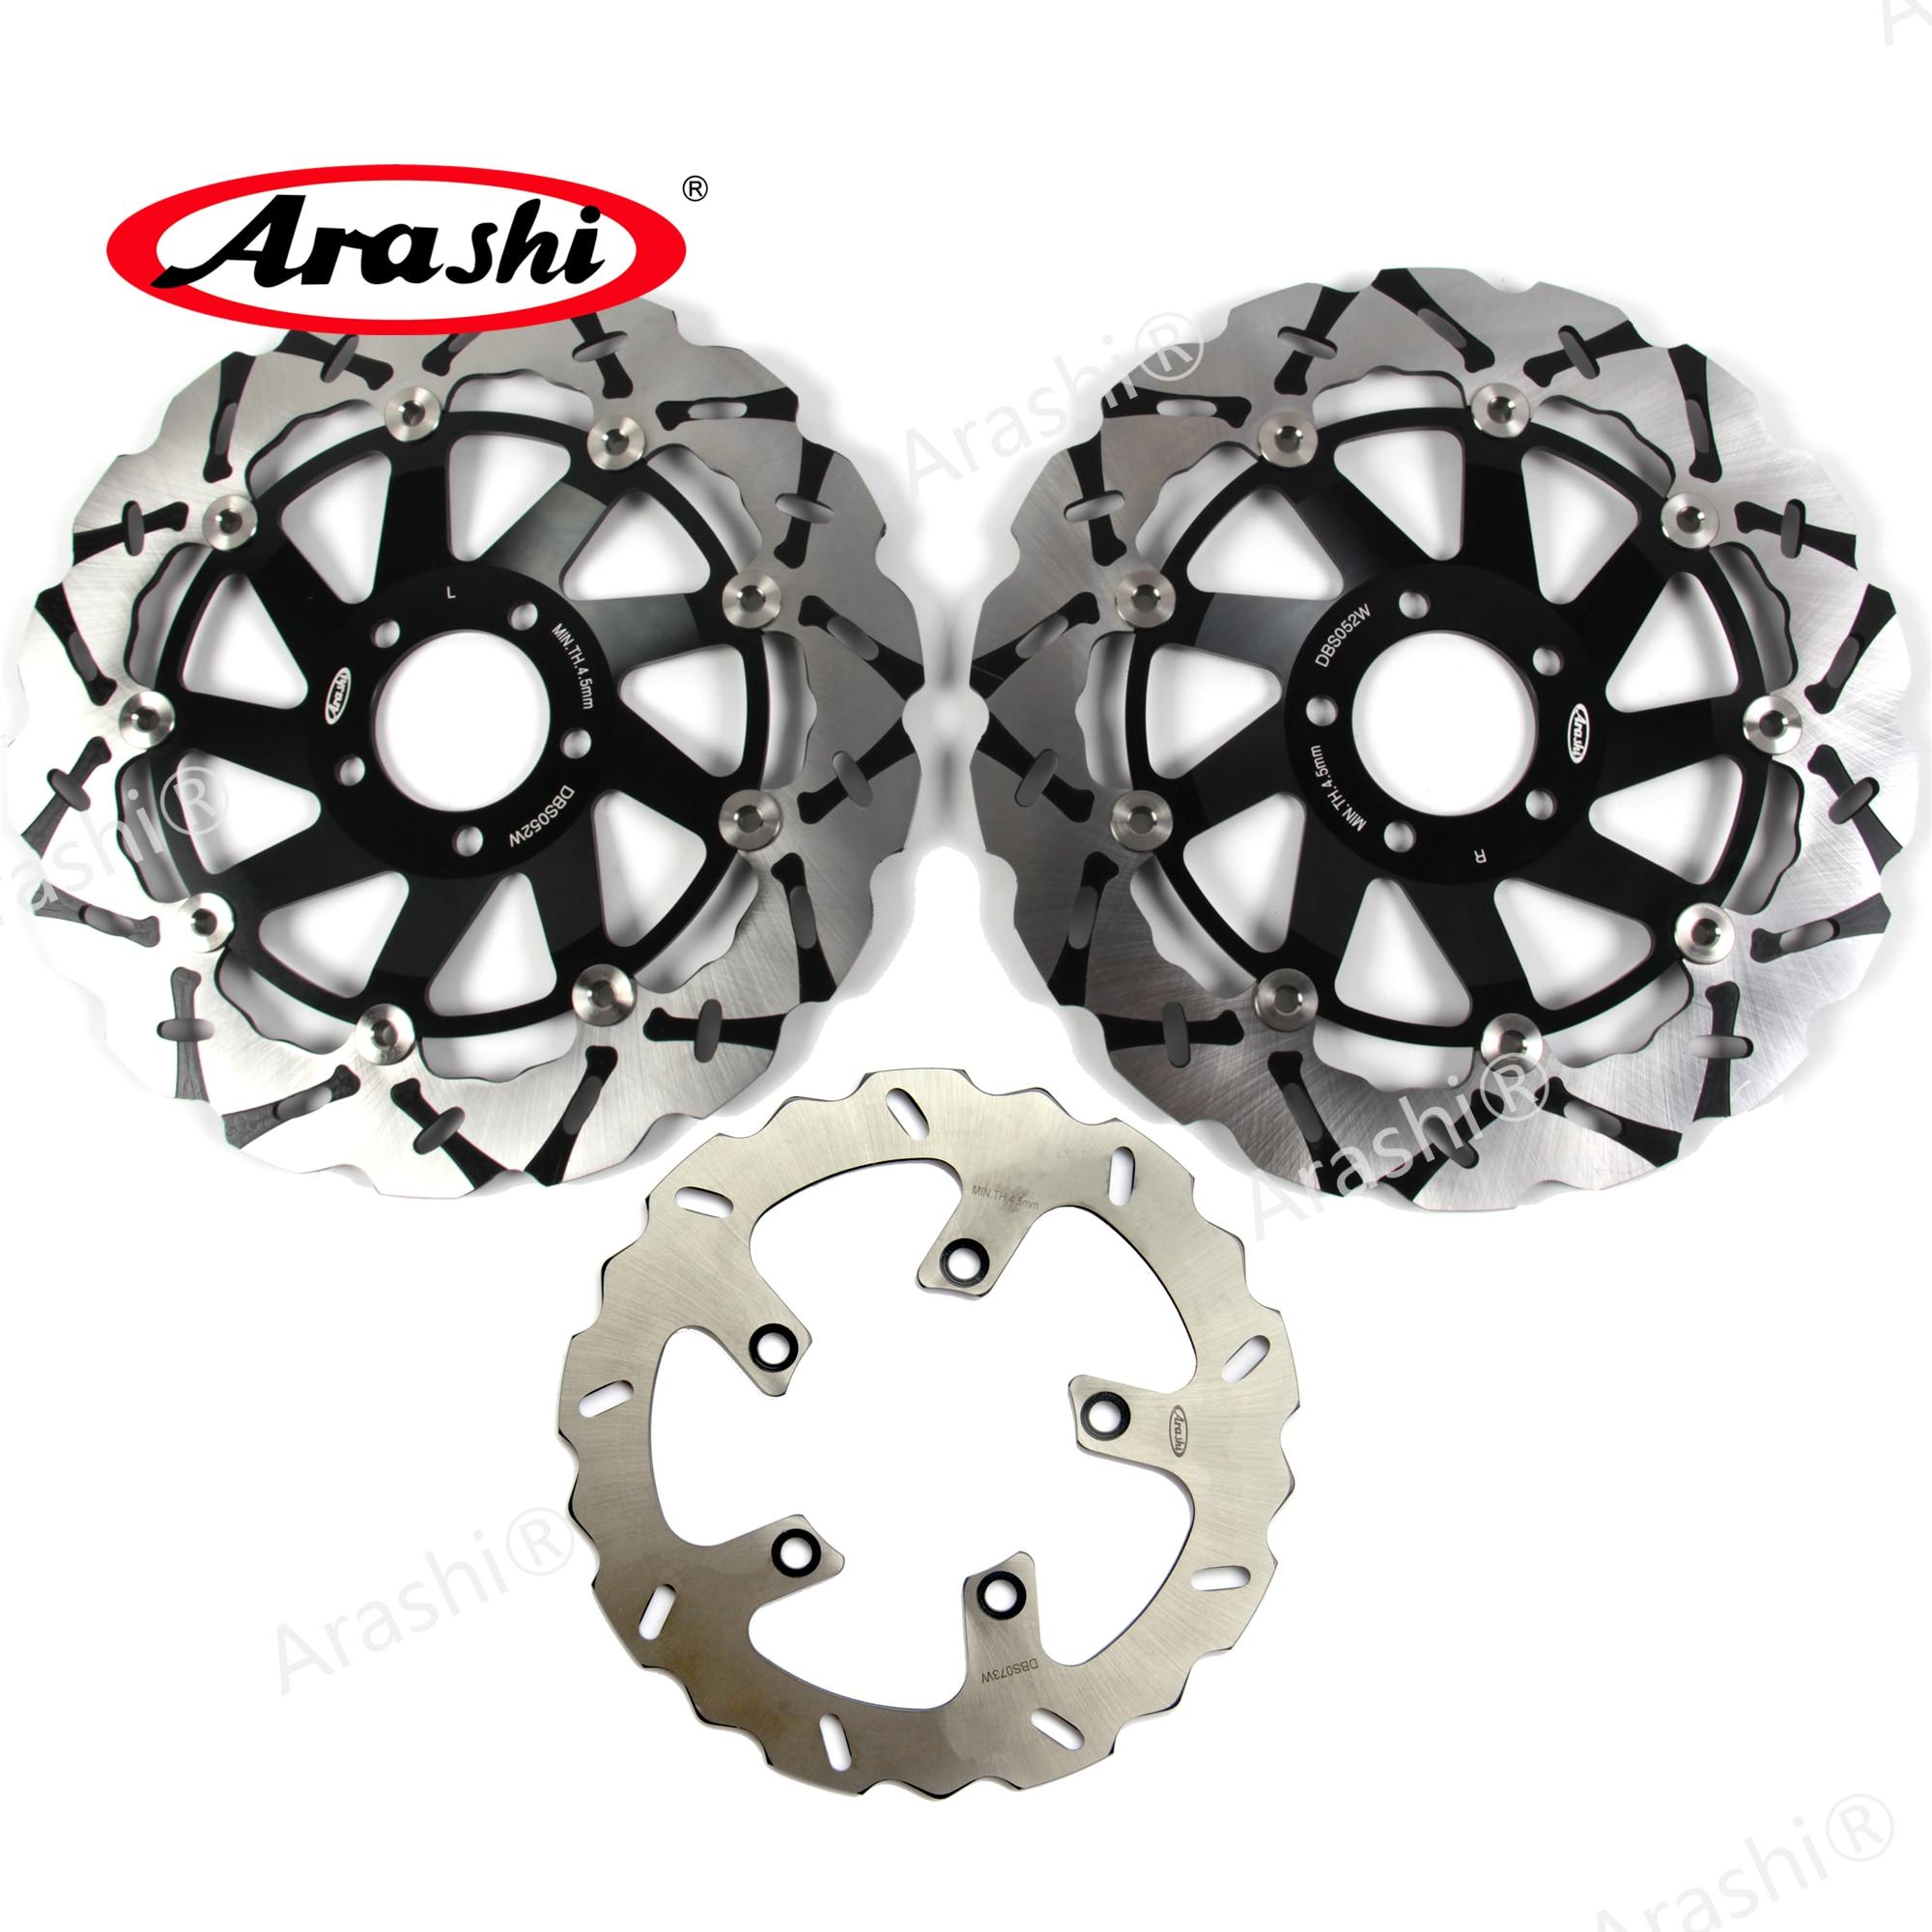 Arashi Front Rear Brake Disc Rotors for KAWASAKI ZRX1200 ZRX1200R ZRX1200S 2001-2006 Motorcycle Replacement Accessories ZRX 1200 R S 2002 2003 2004 2005 Black ZRX1100